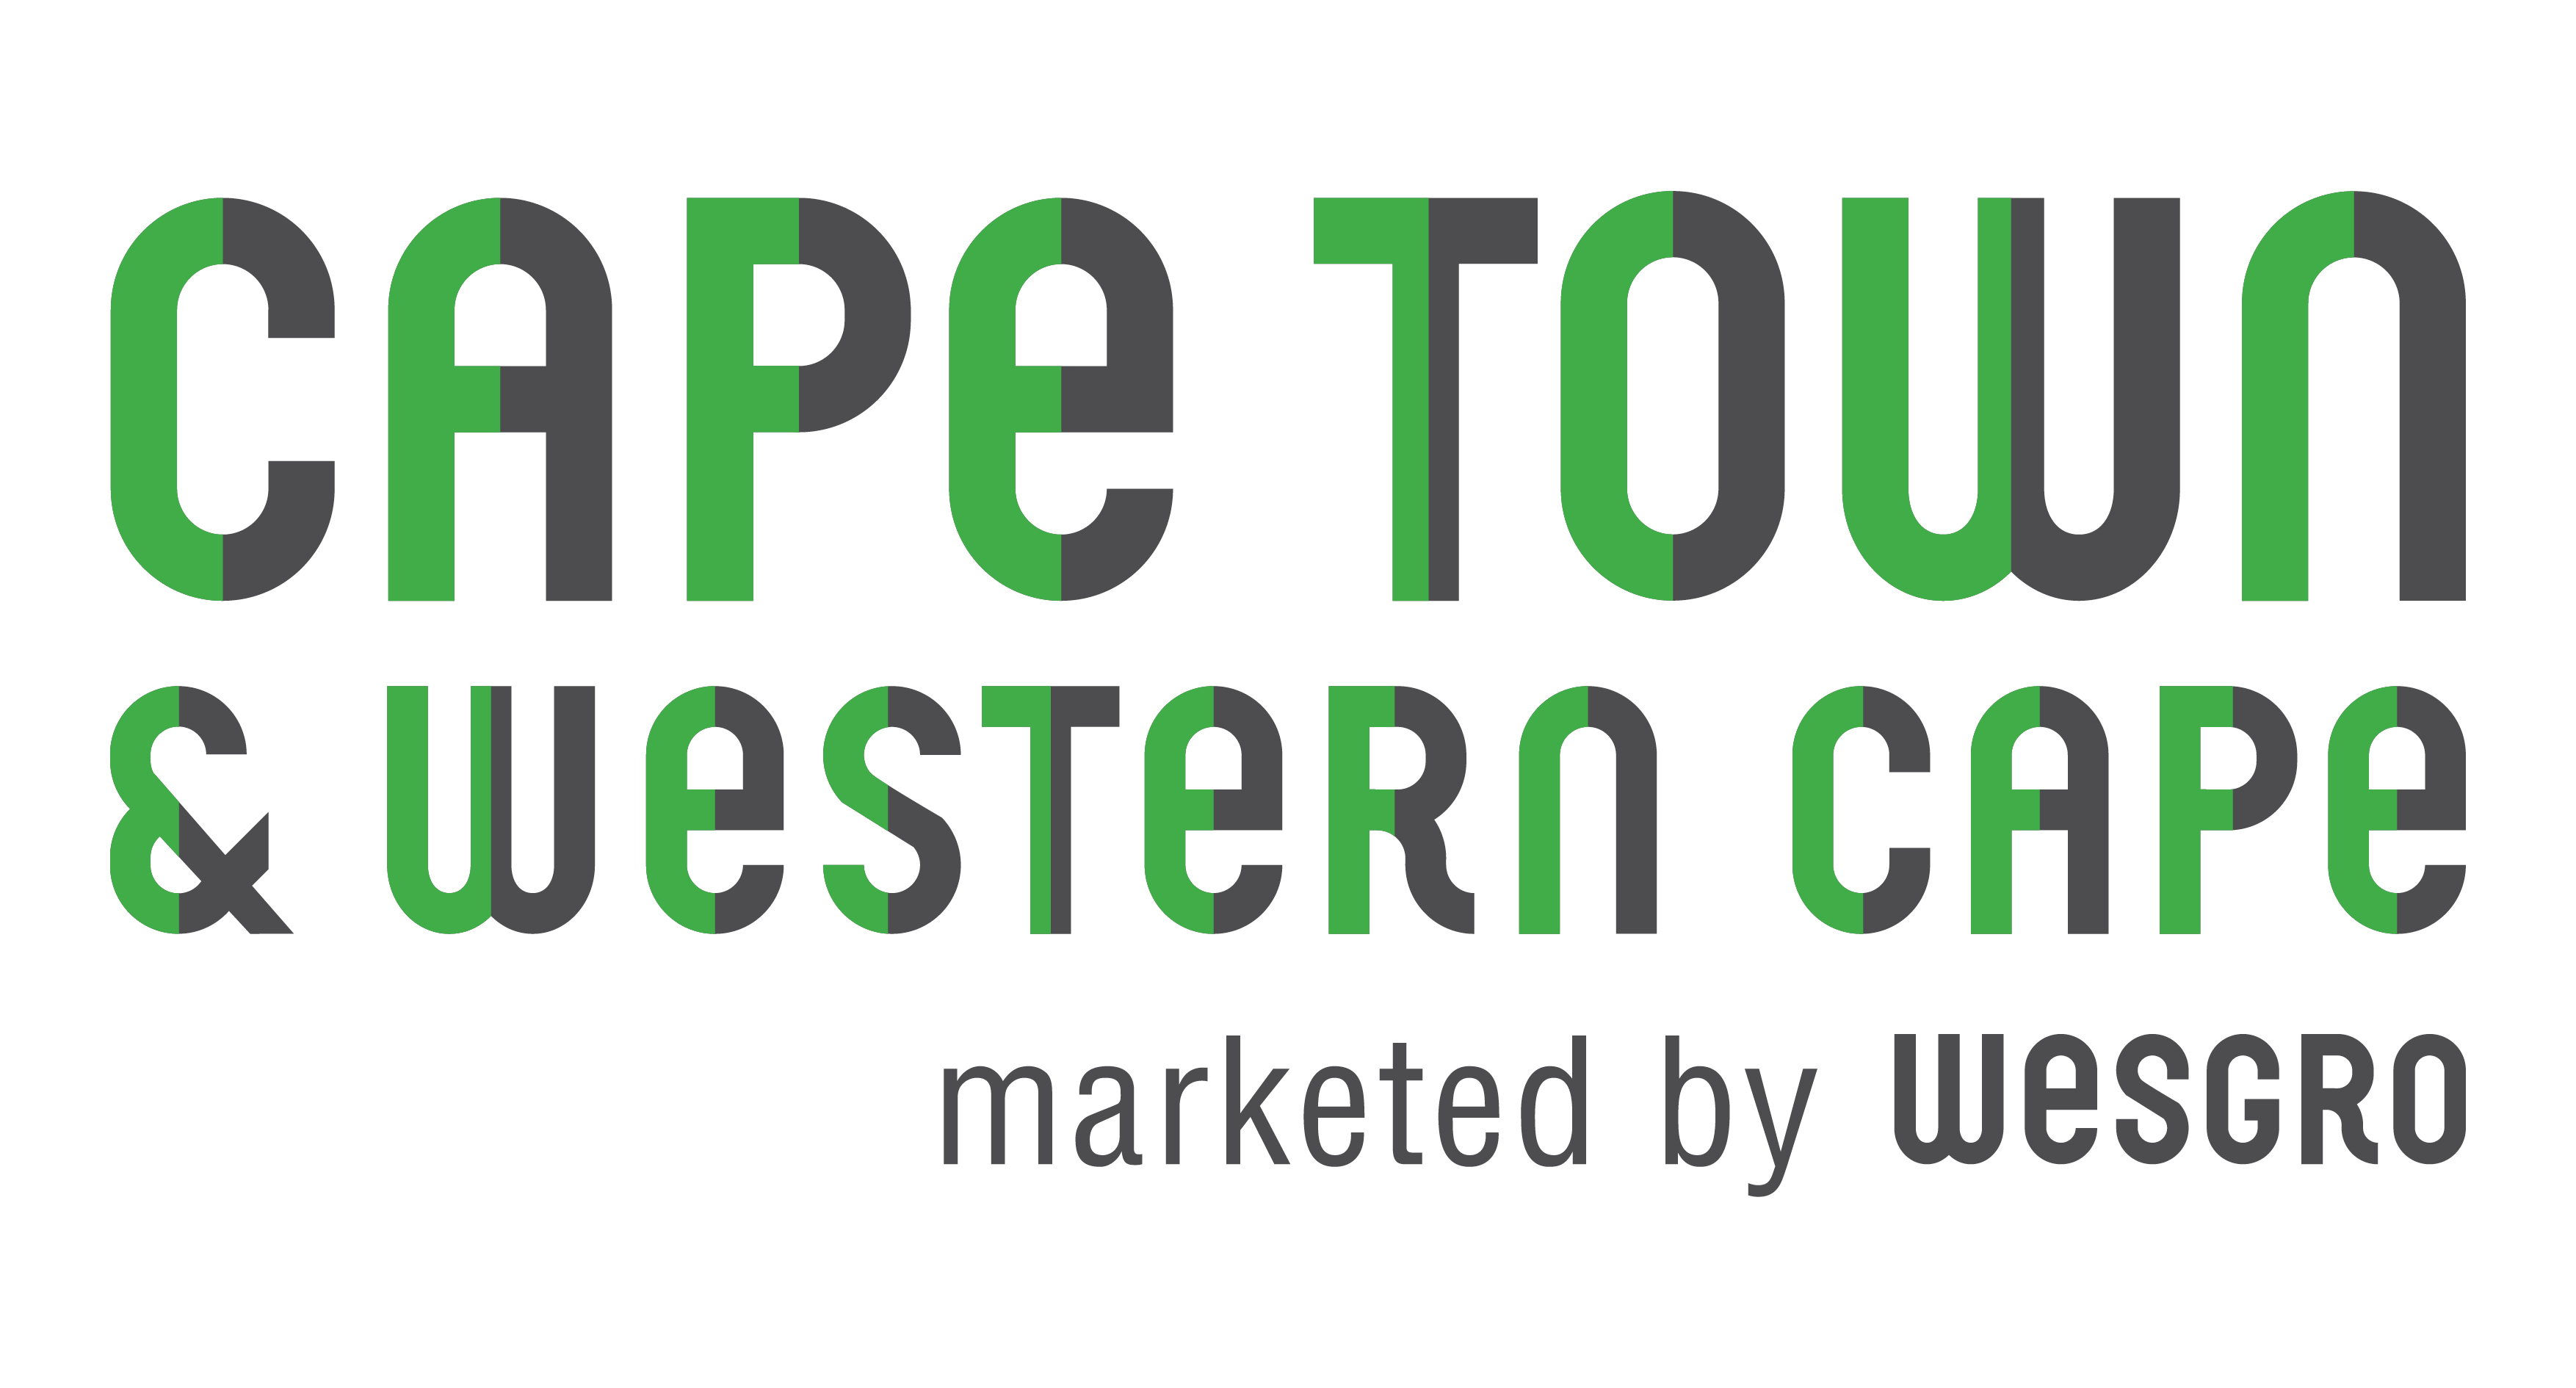 CTWC logo green